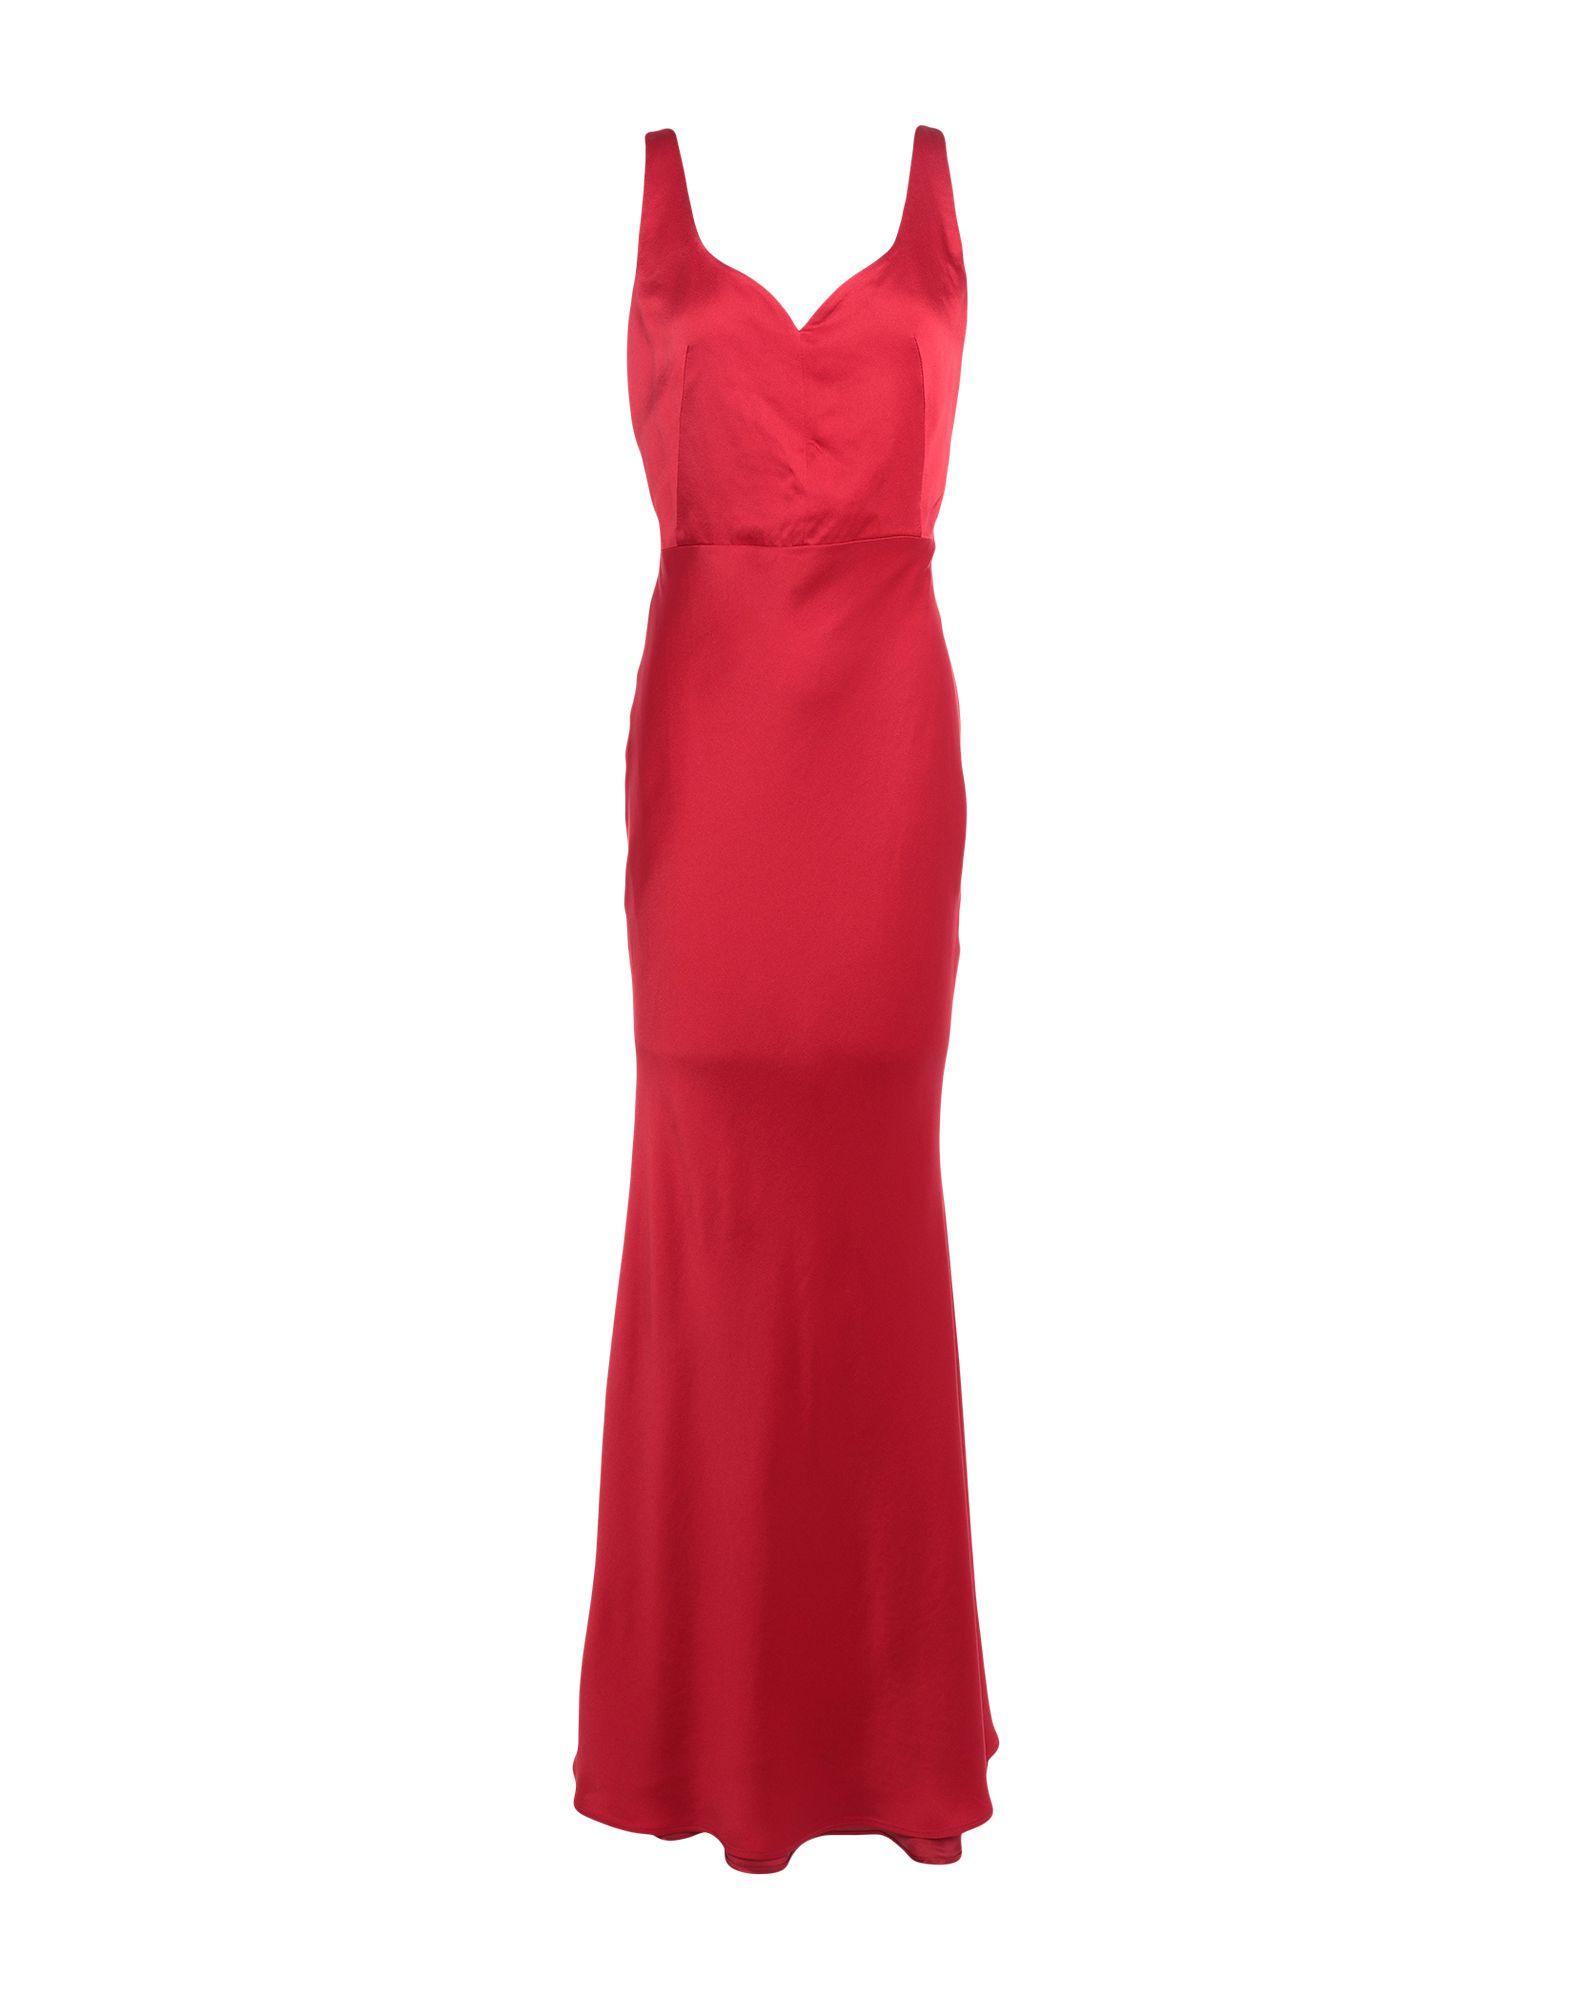 SIMONA CORSELLINI Длинное платье цена и фото